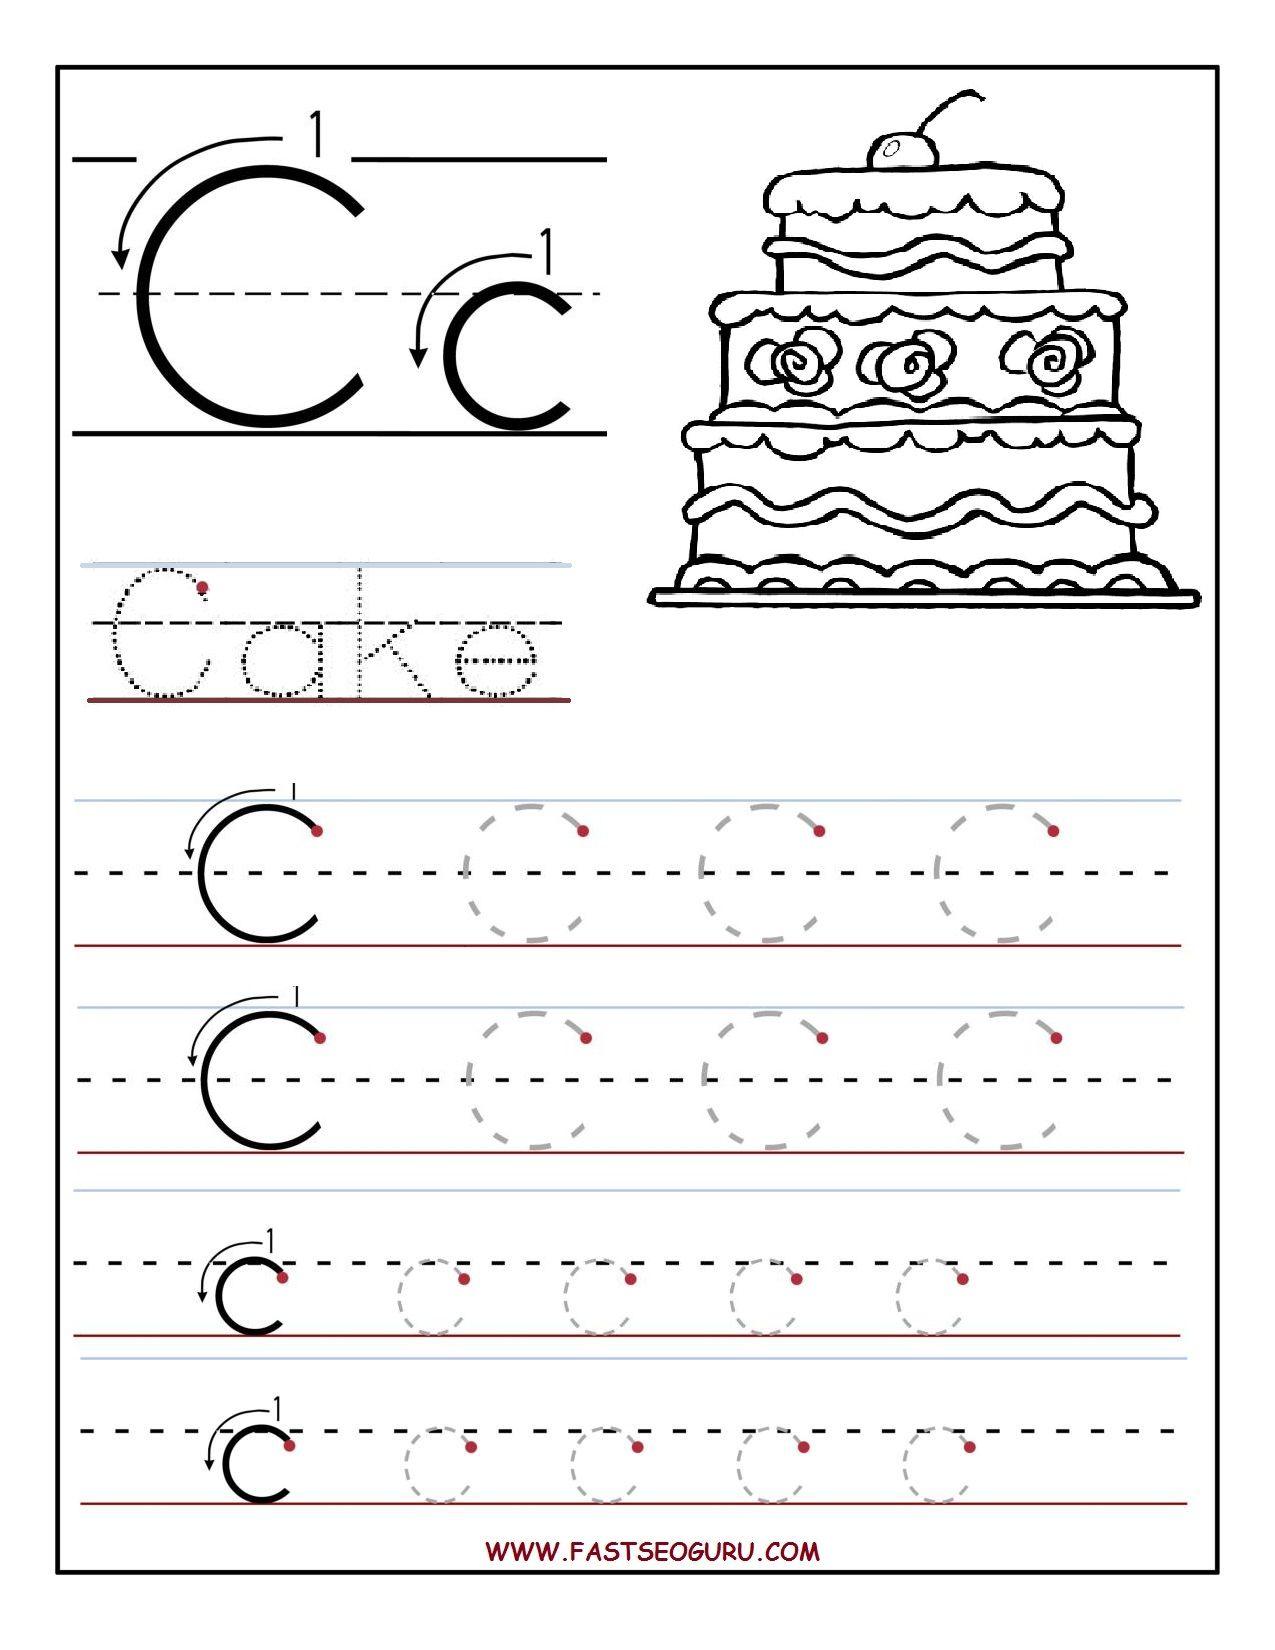 Printable Letter C Tracing Worksheets For Preschool Jpg 1 275 1 650 Pixels Alphabet Worksheets Preschool Tracing Worksheets Preschool Free Preschool Worksheets